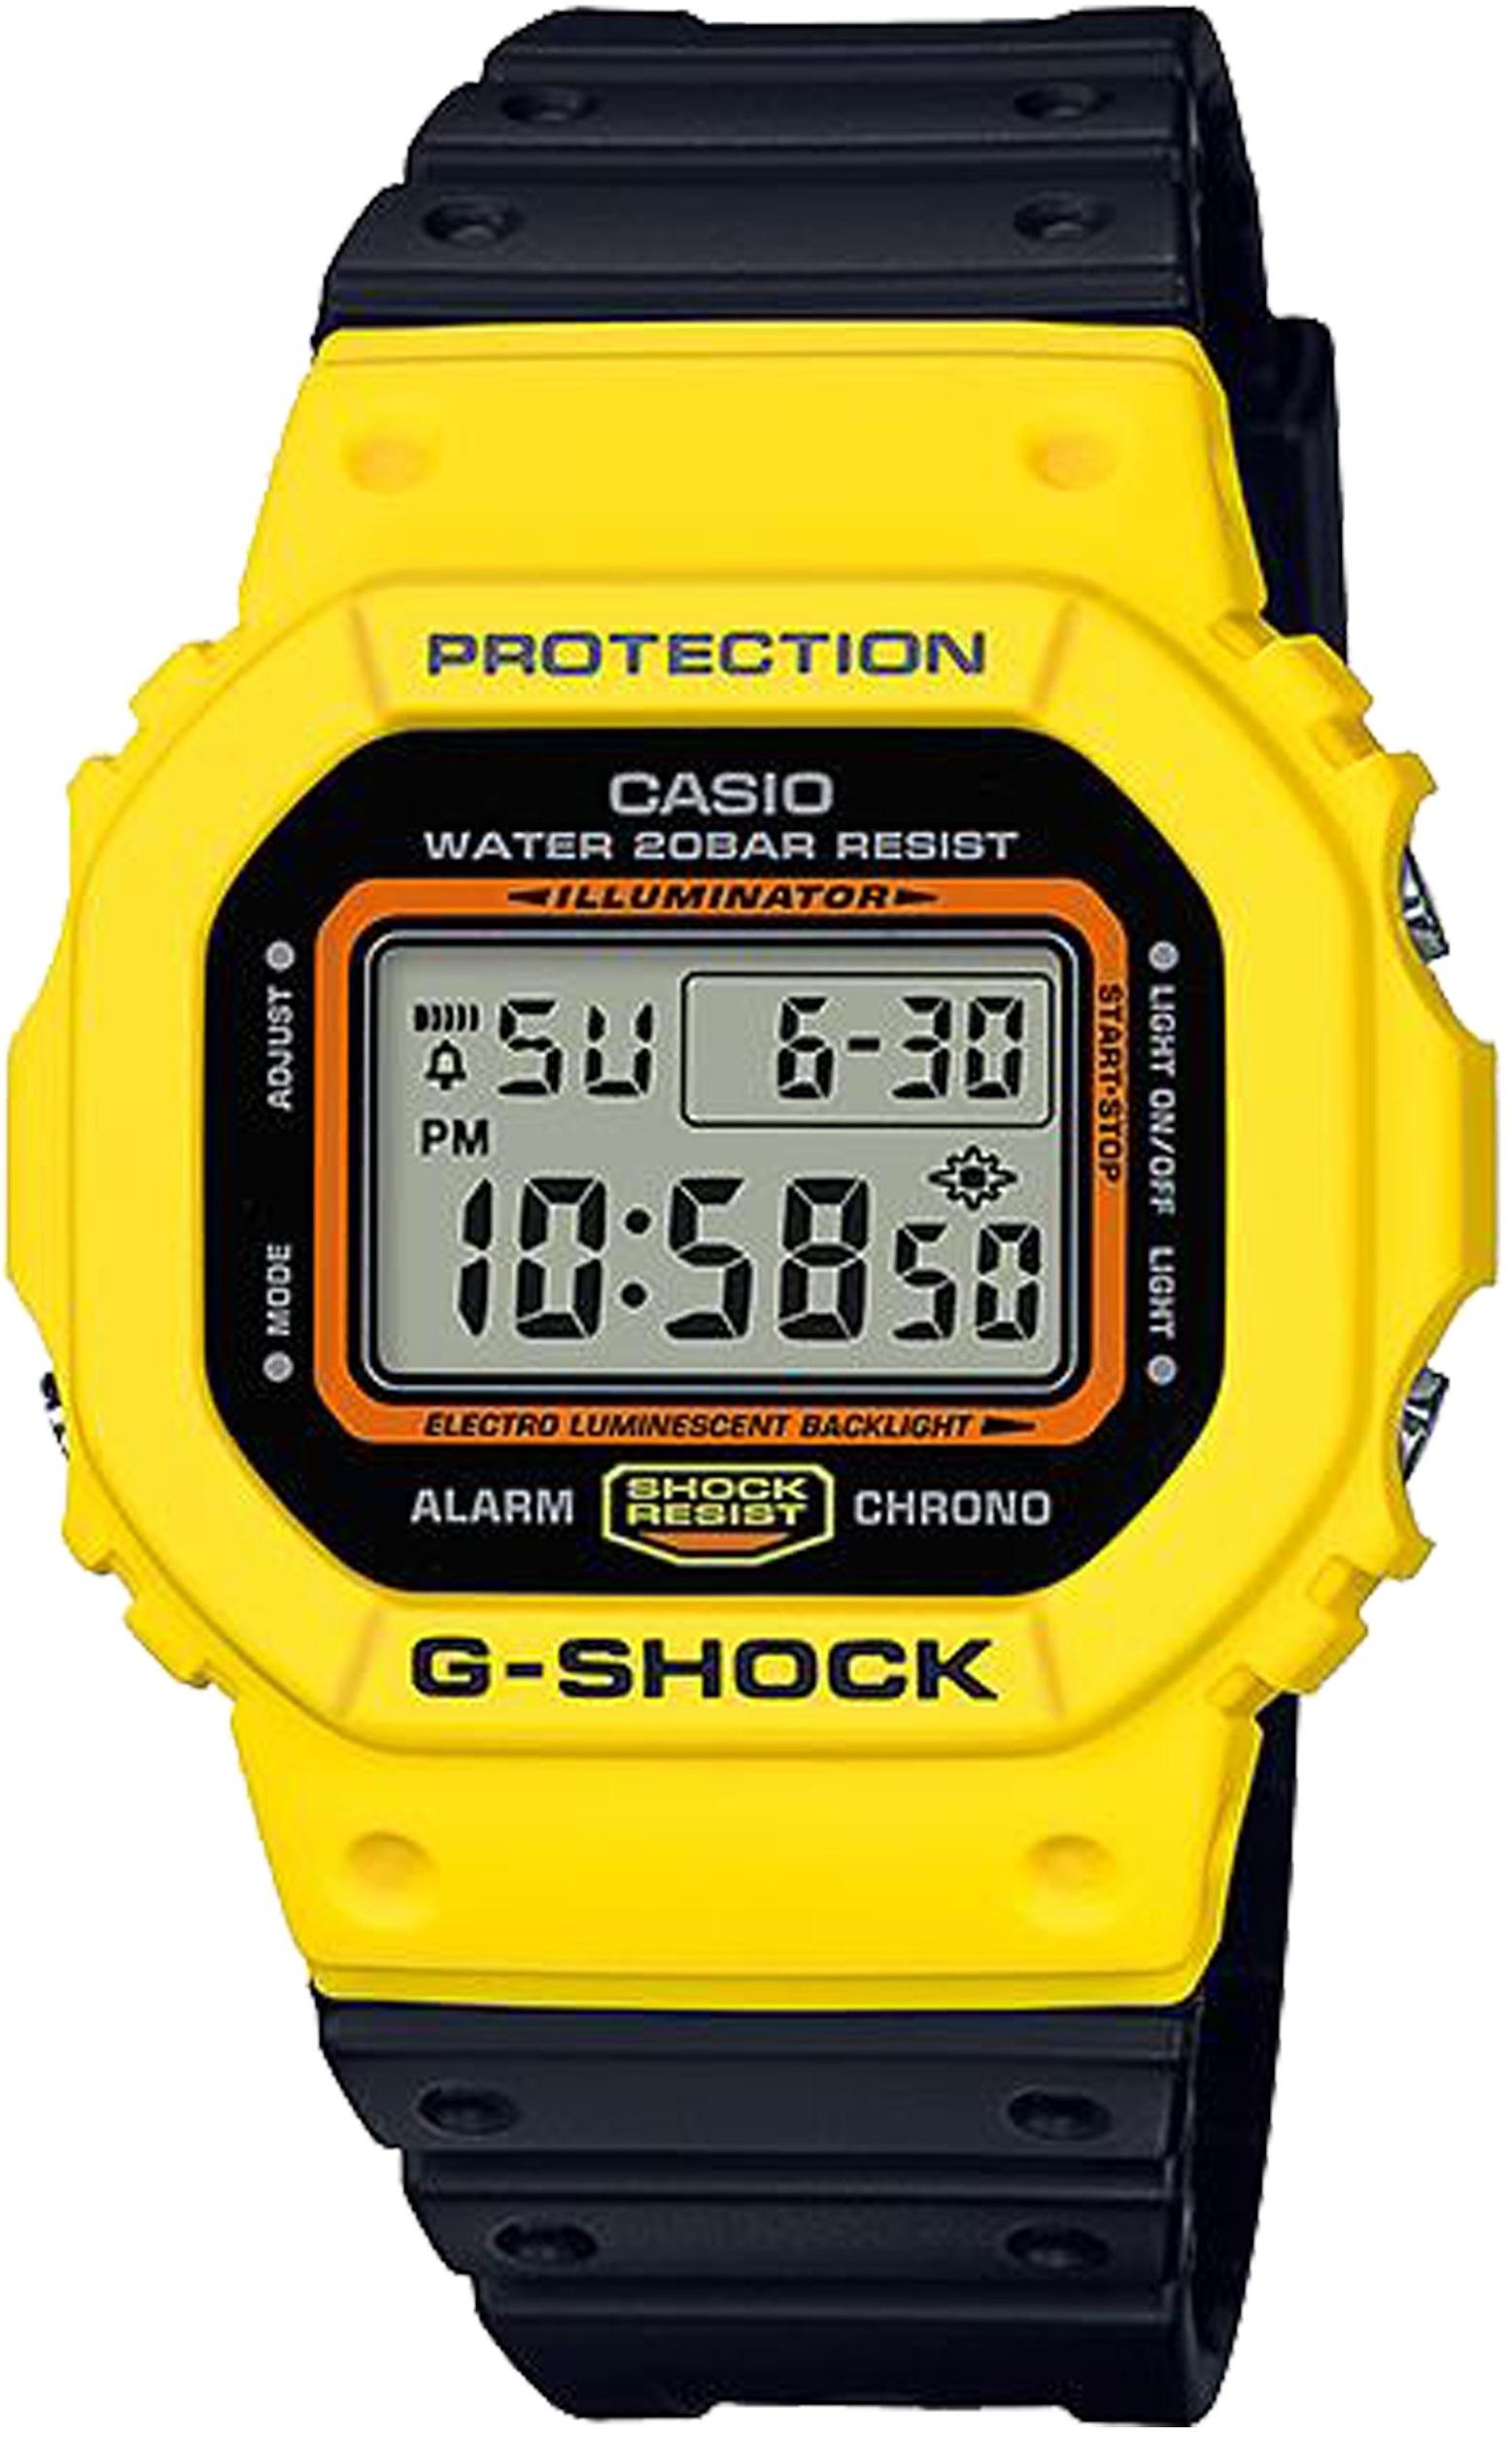 Мужские часы Casio G-Shock DW-5600TB-1ER